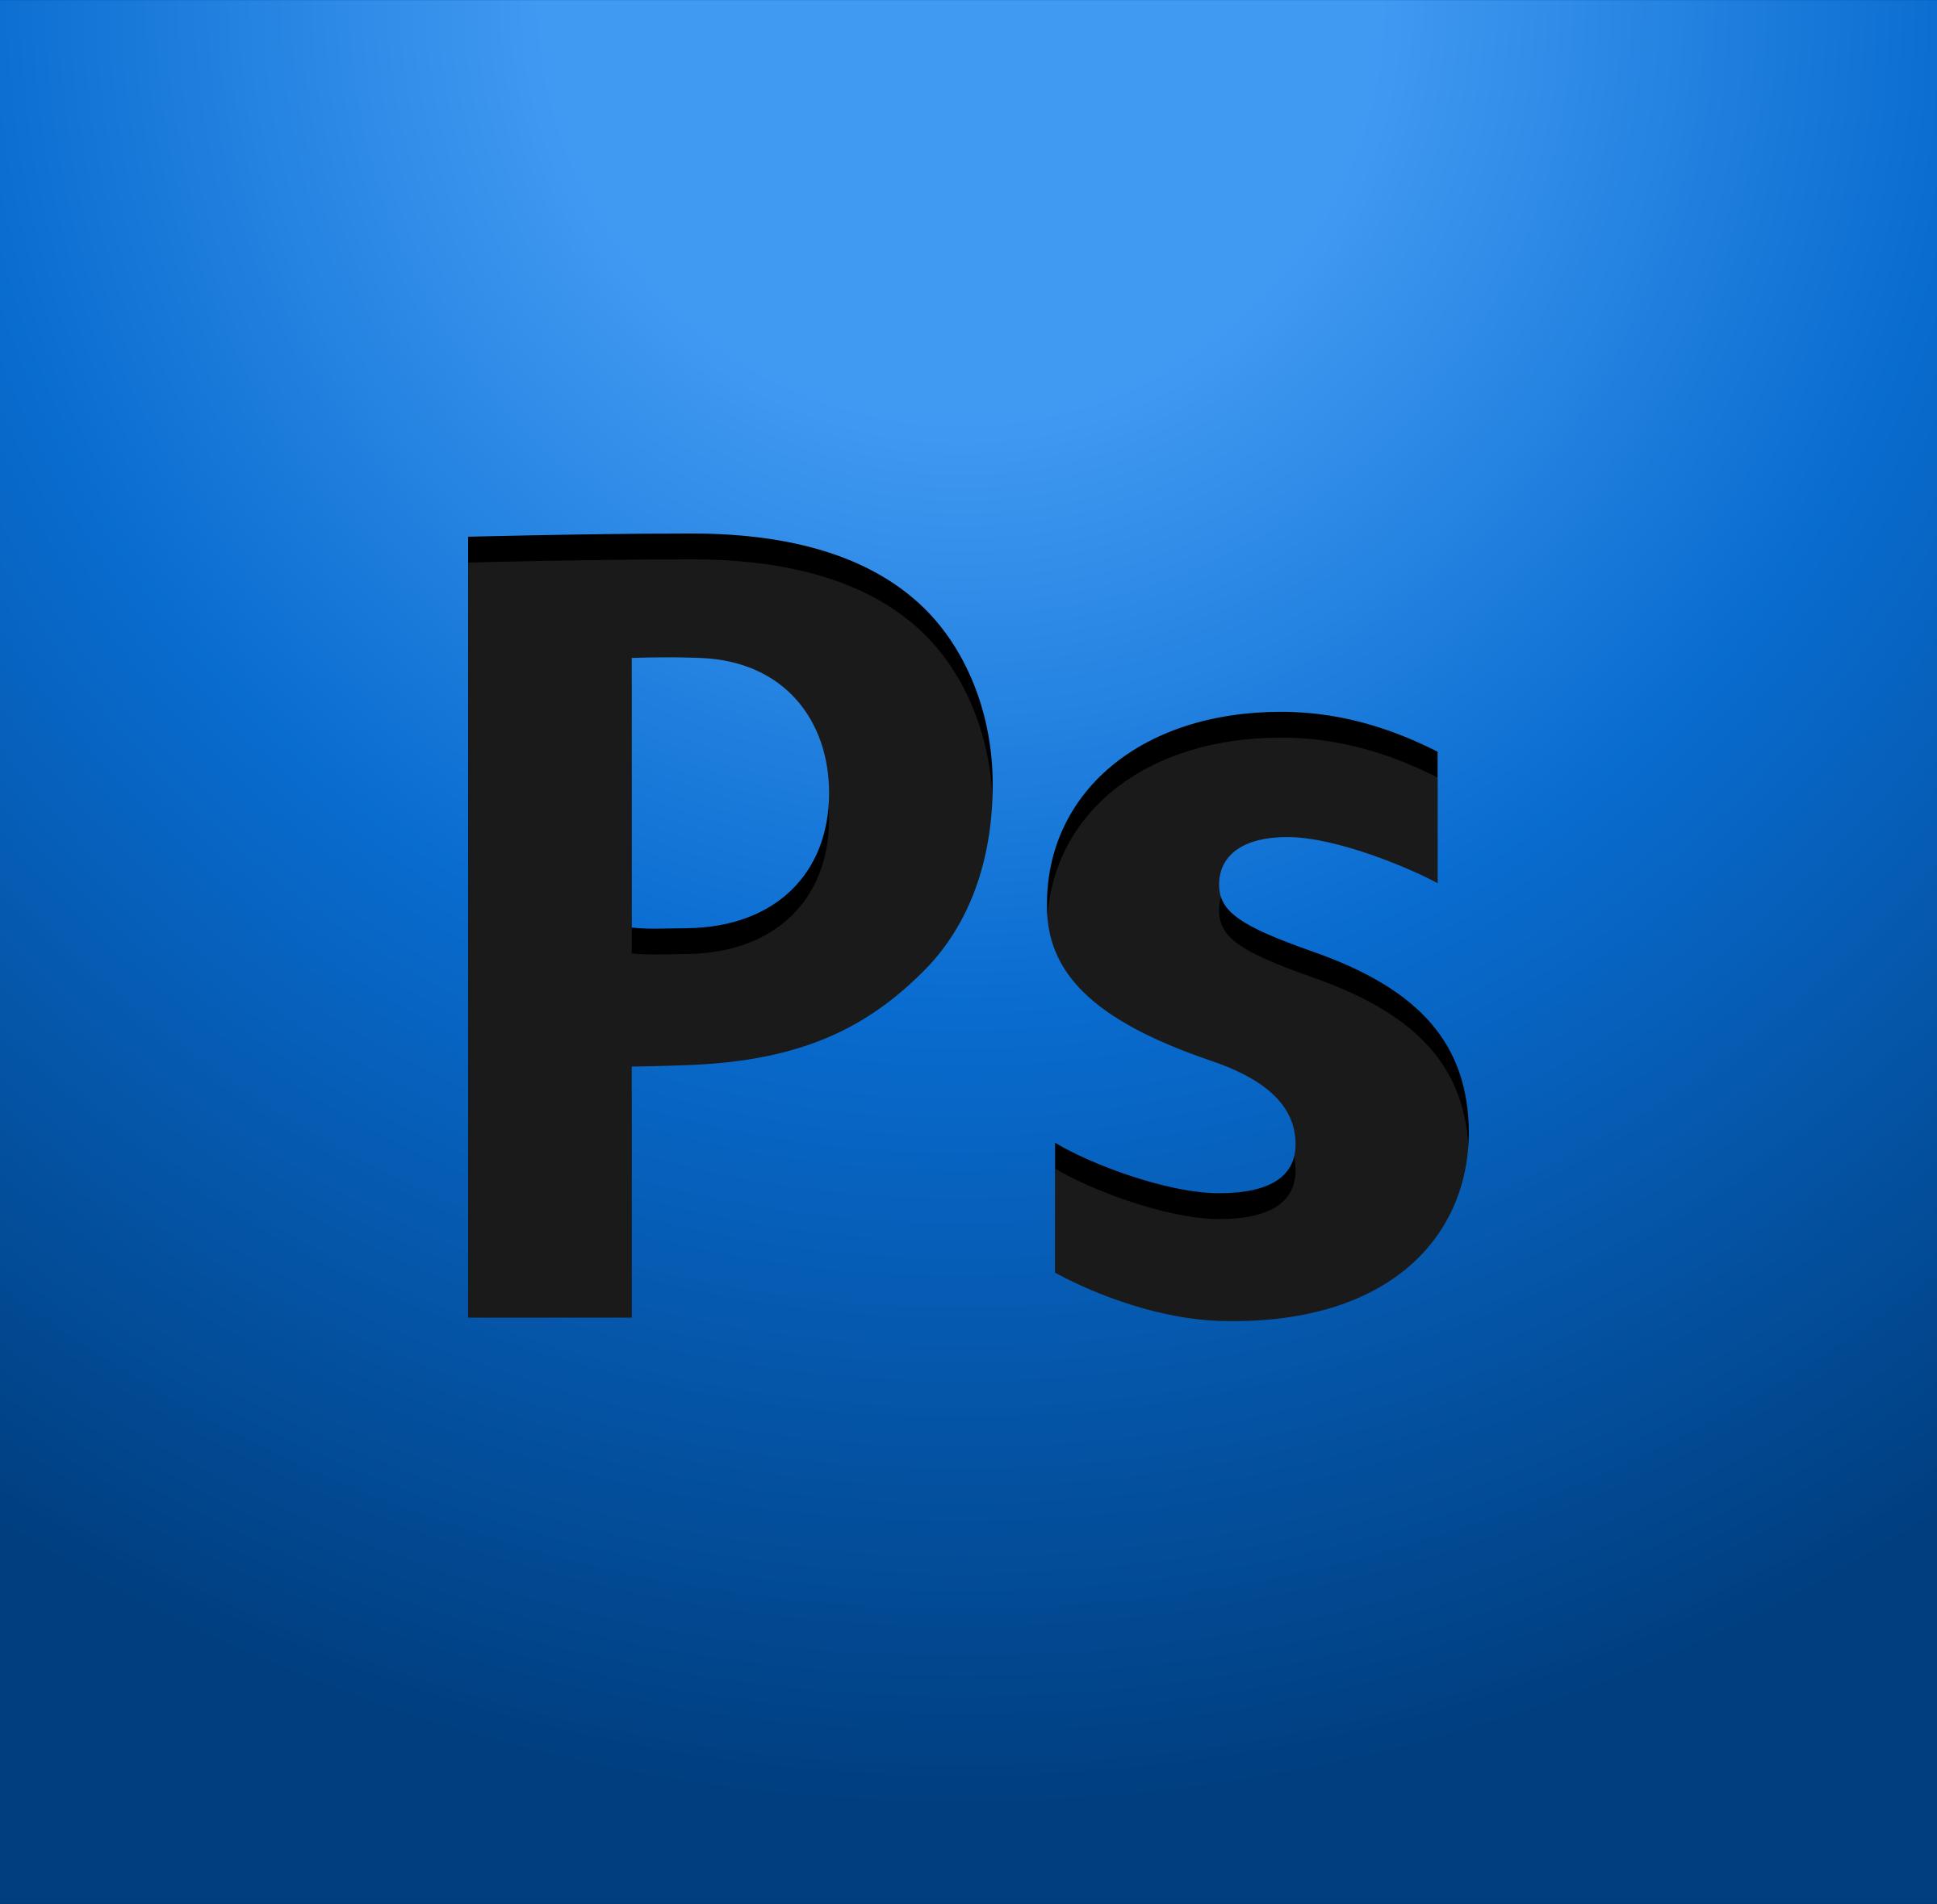 Adobe Photoshop Cs4 Logo Png Transparent Svg Vector Freebie Supply